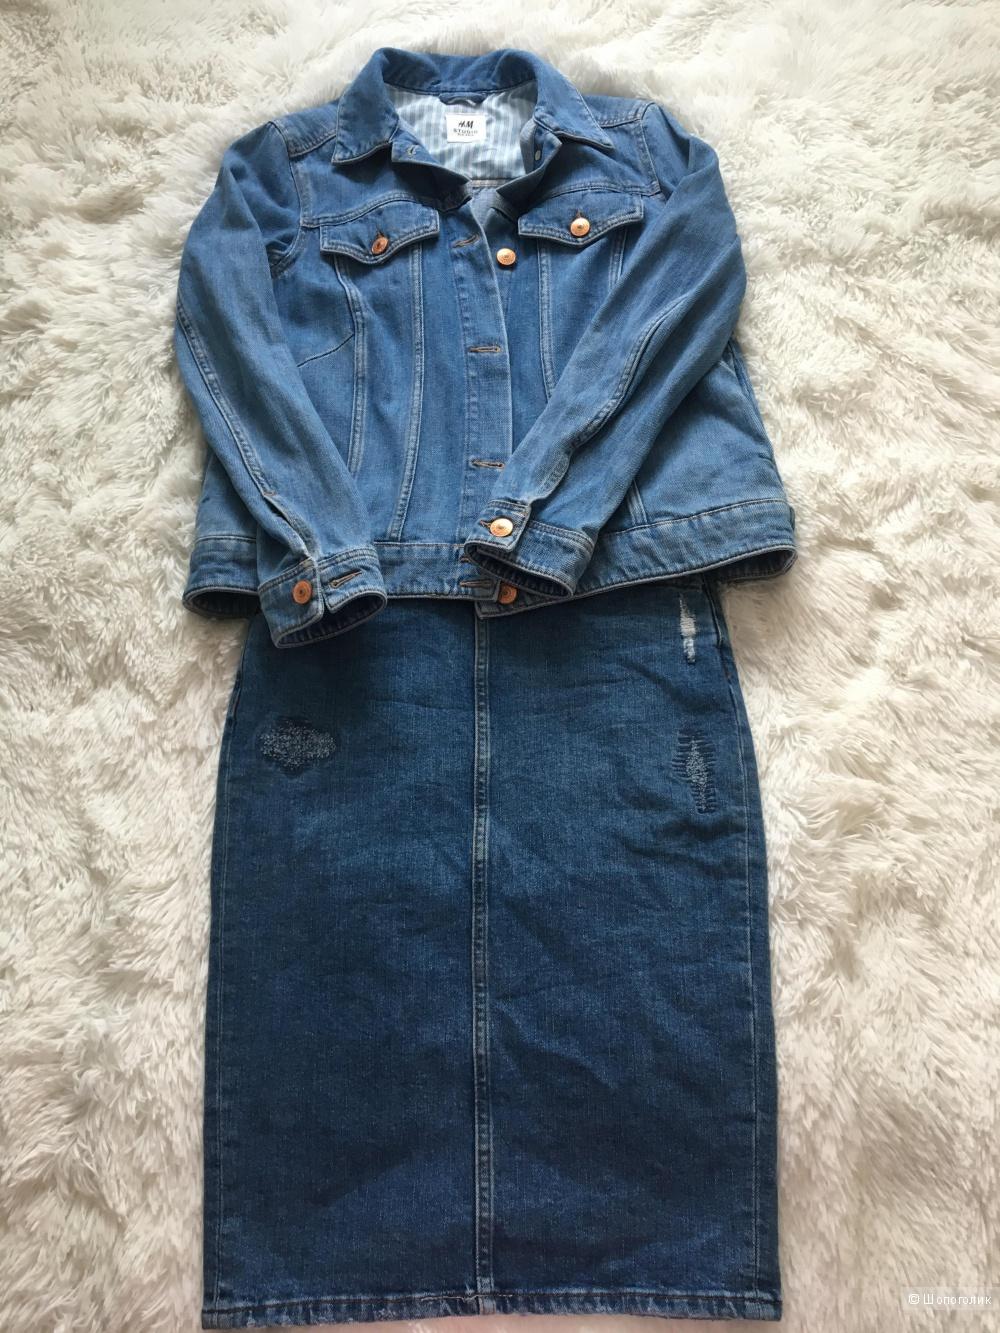 Комплект джинсовка H&M, размер S+Юбка Denim co, размер S